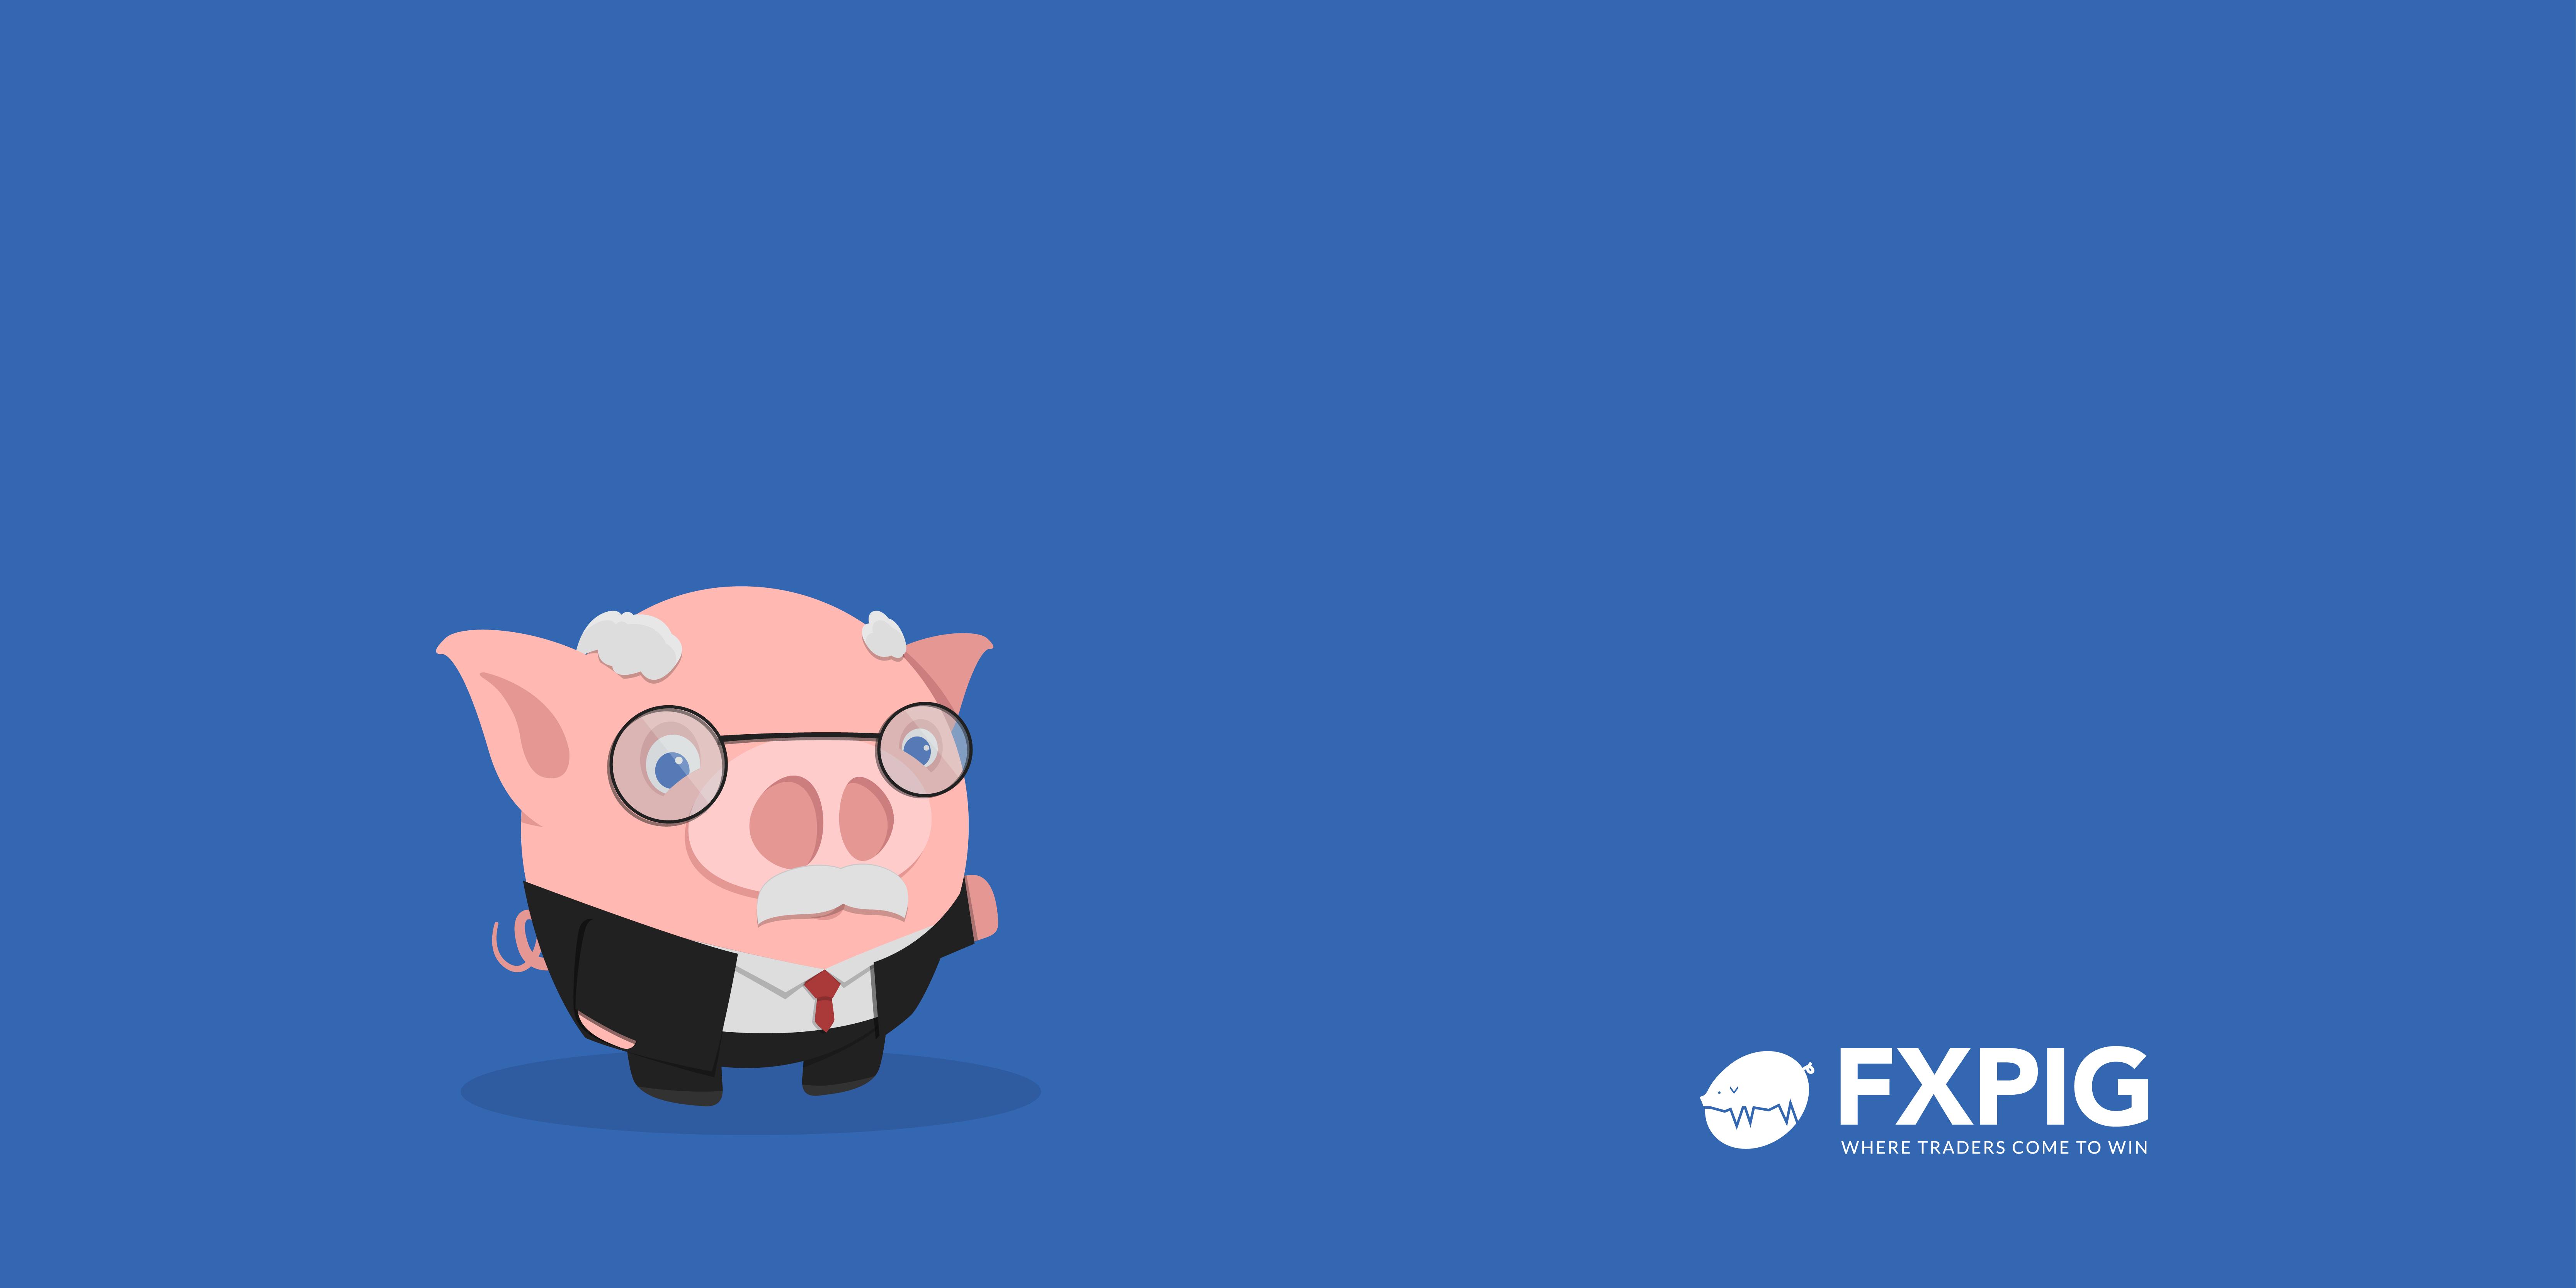 FOREX_Trading-wisdom_Quote-Pig-Insider_FXPIG